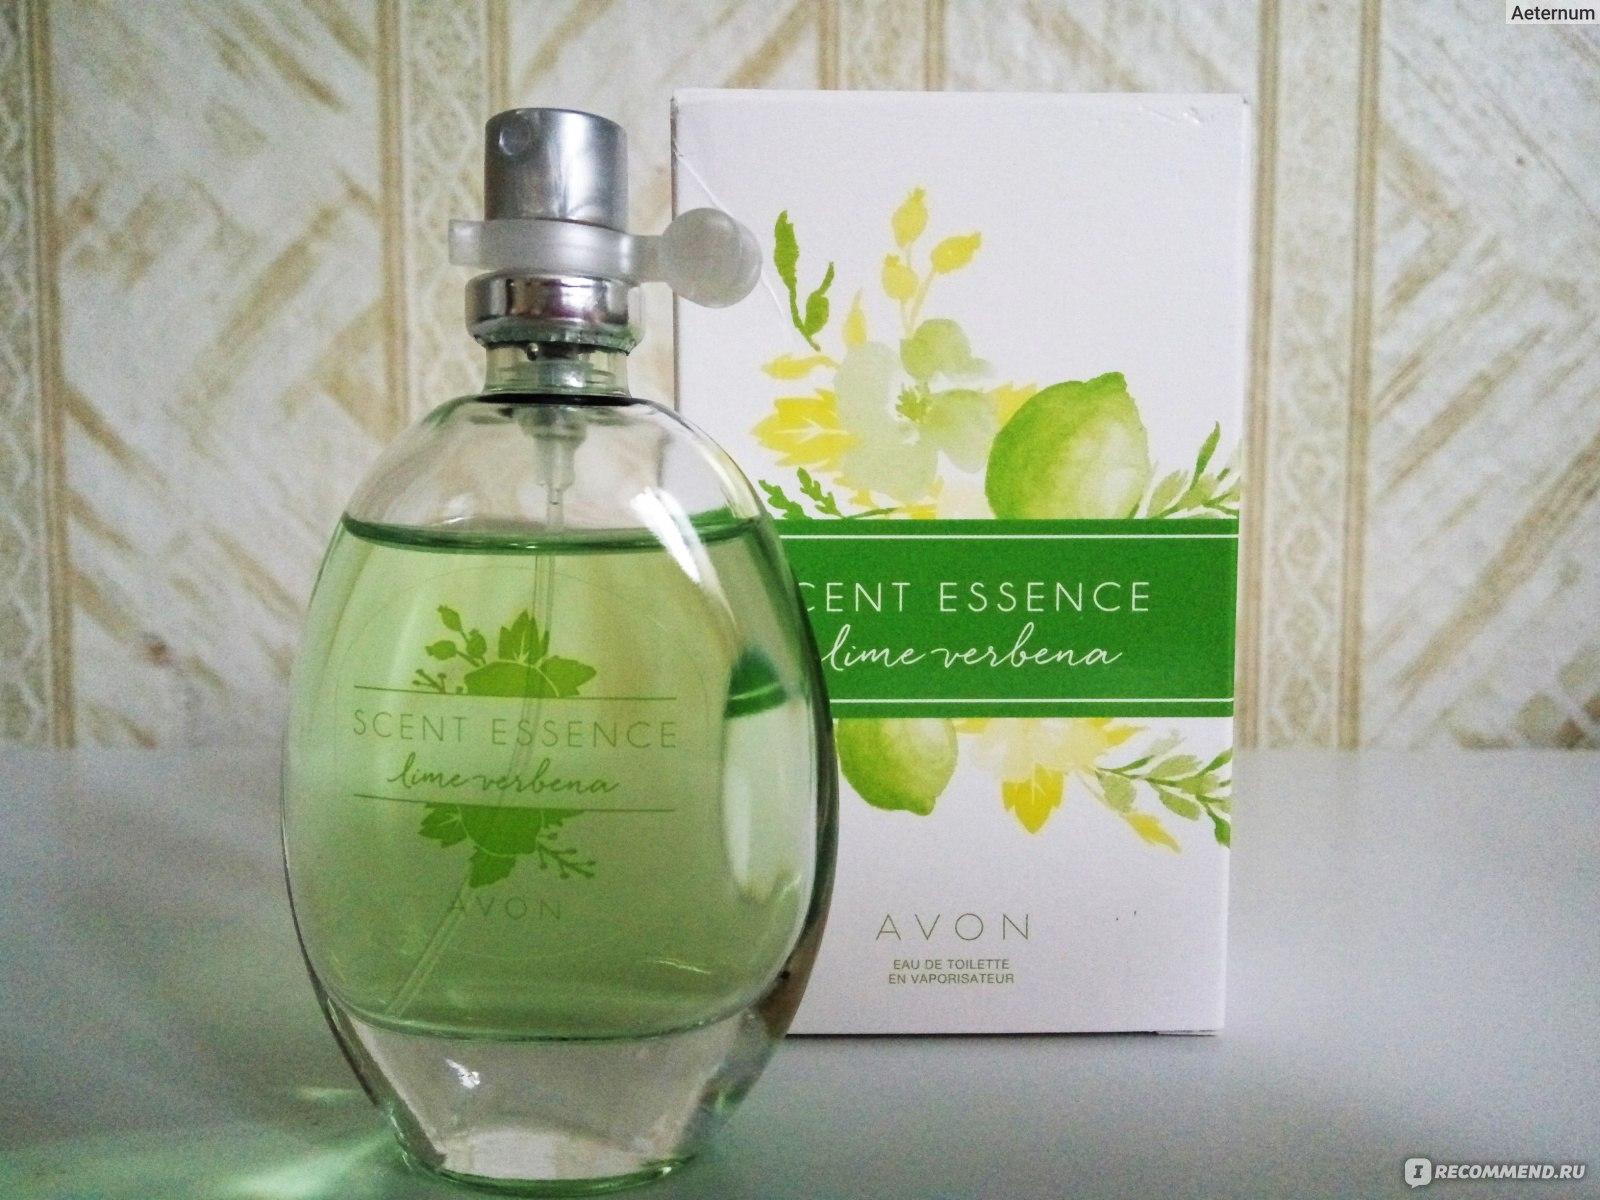 Ogromny Avon Scent Essence Lime Verbena - «Достойный вариант фруктово EW84